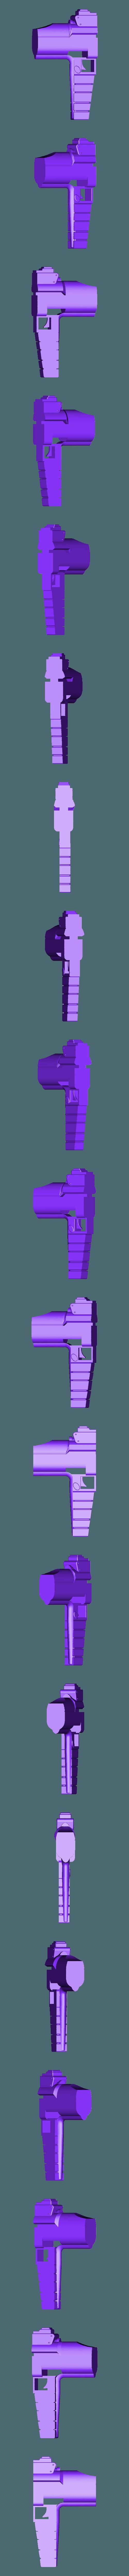 rifle_part_3.stl Download free STL file Photon Rifle (The Flash) • 3D print template, poblocki1982